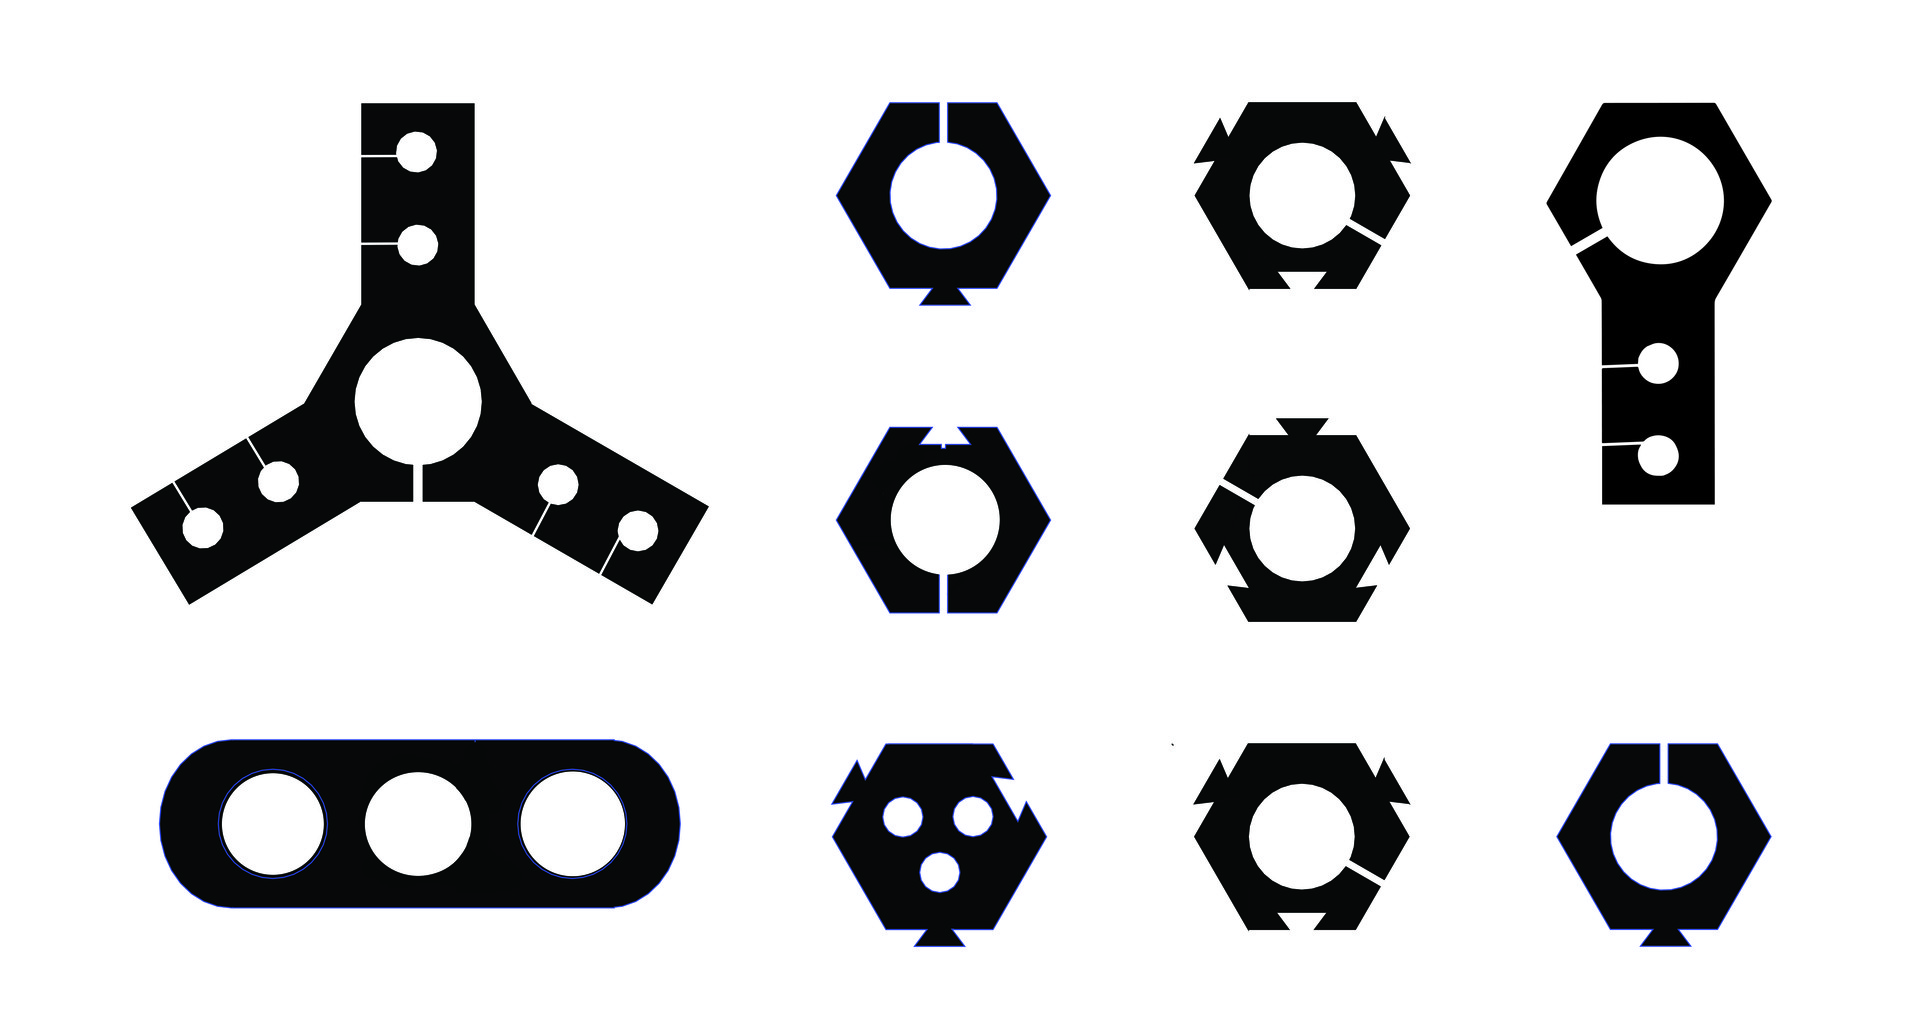 shantell martin  u2014 work  3d printed drawing tools